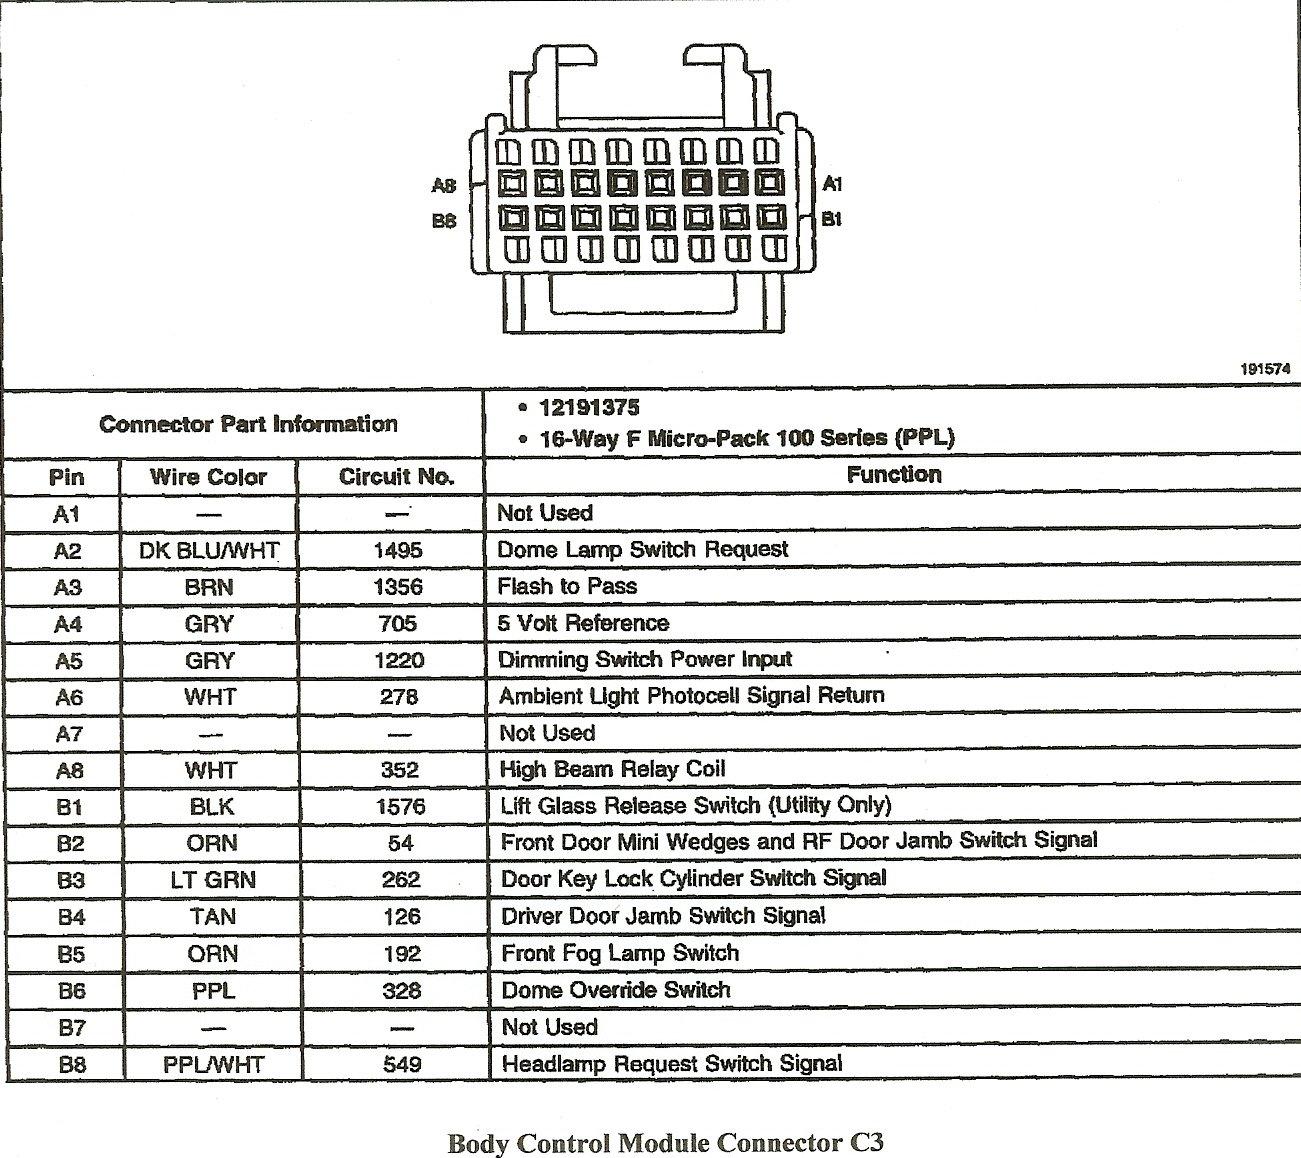 [DIAGRAM_38YU]  NL_9394] Gm Body Control Module Wiring Diagram Wiring Diagram | Gm Body Control Module Wiring Diagram |  | Xaem Nekout Mohammedshrine Librar Wiring 101